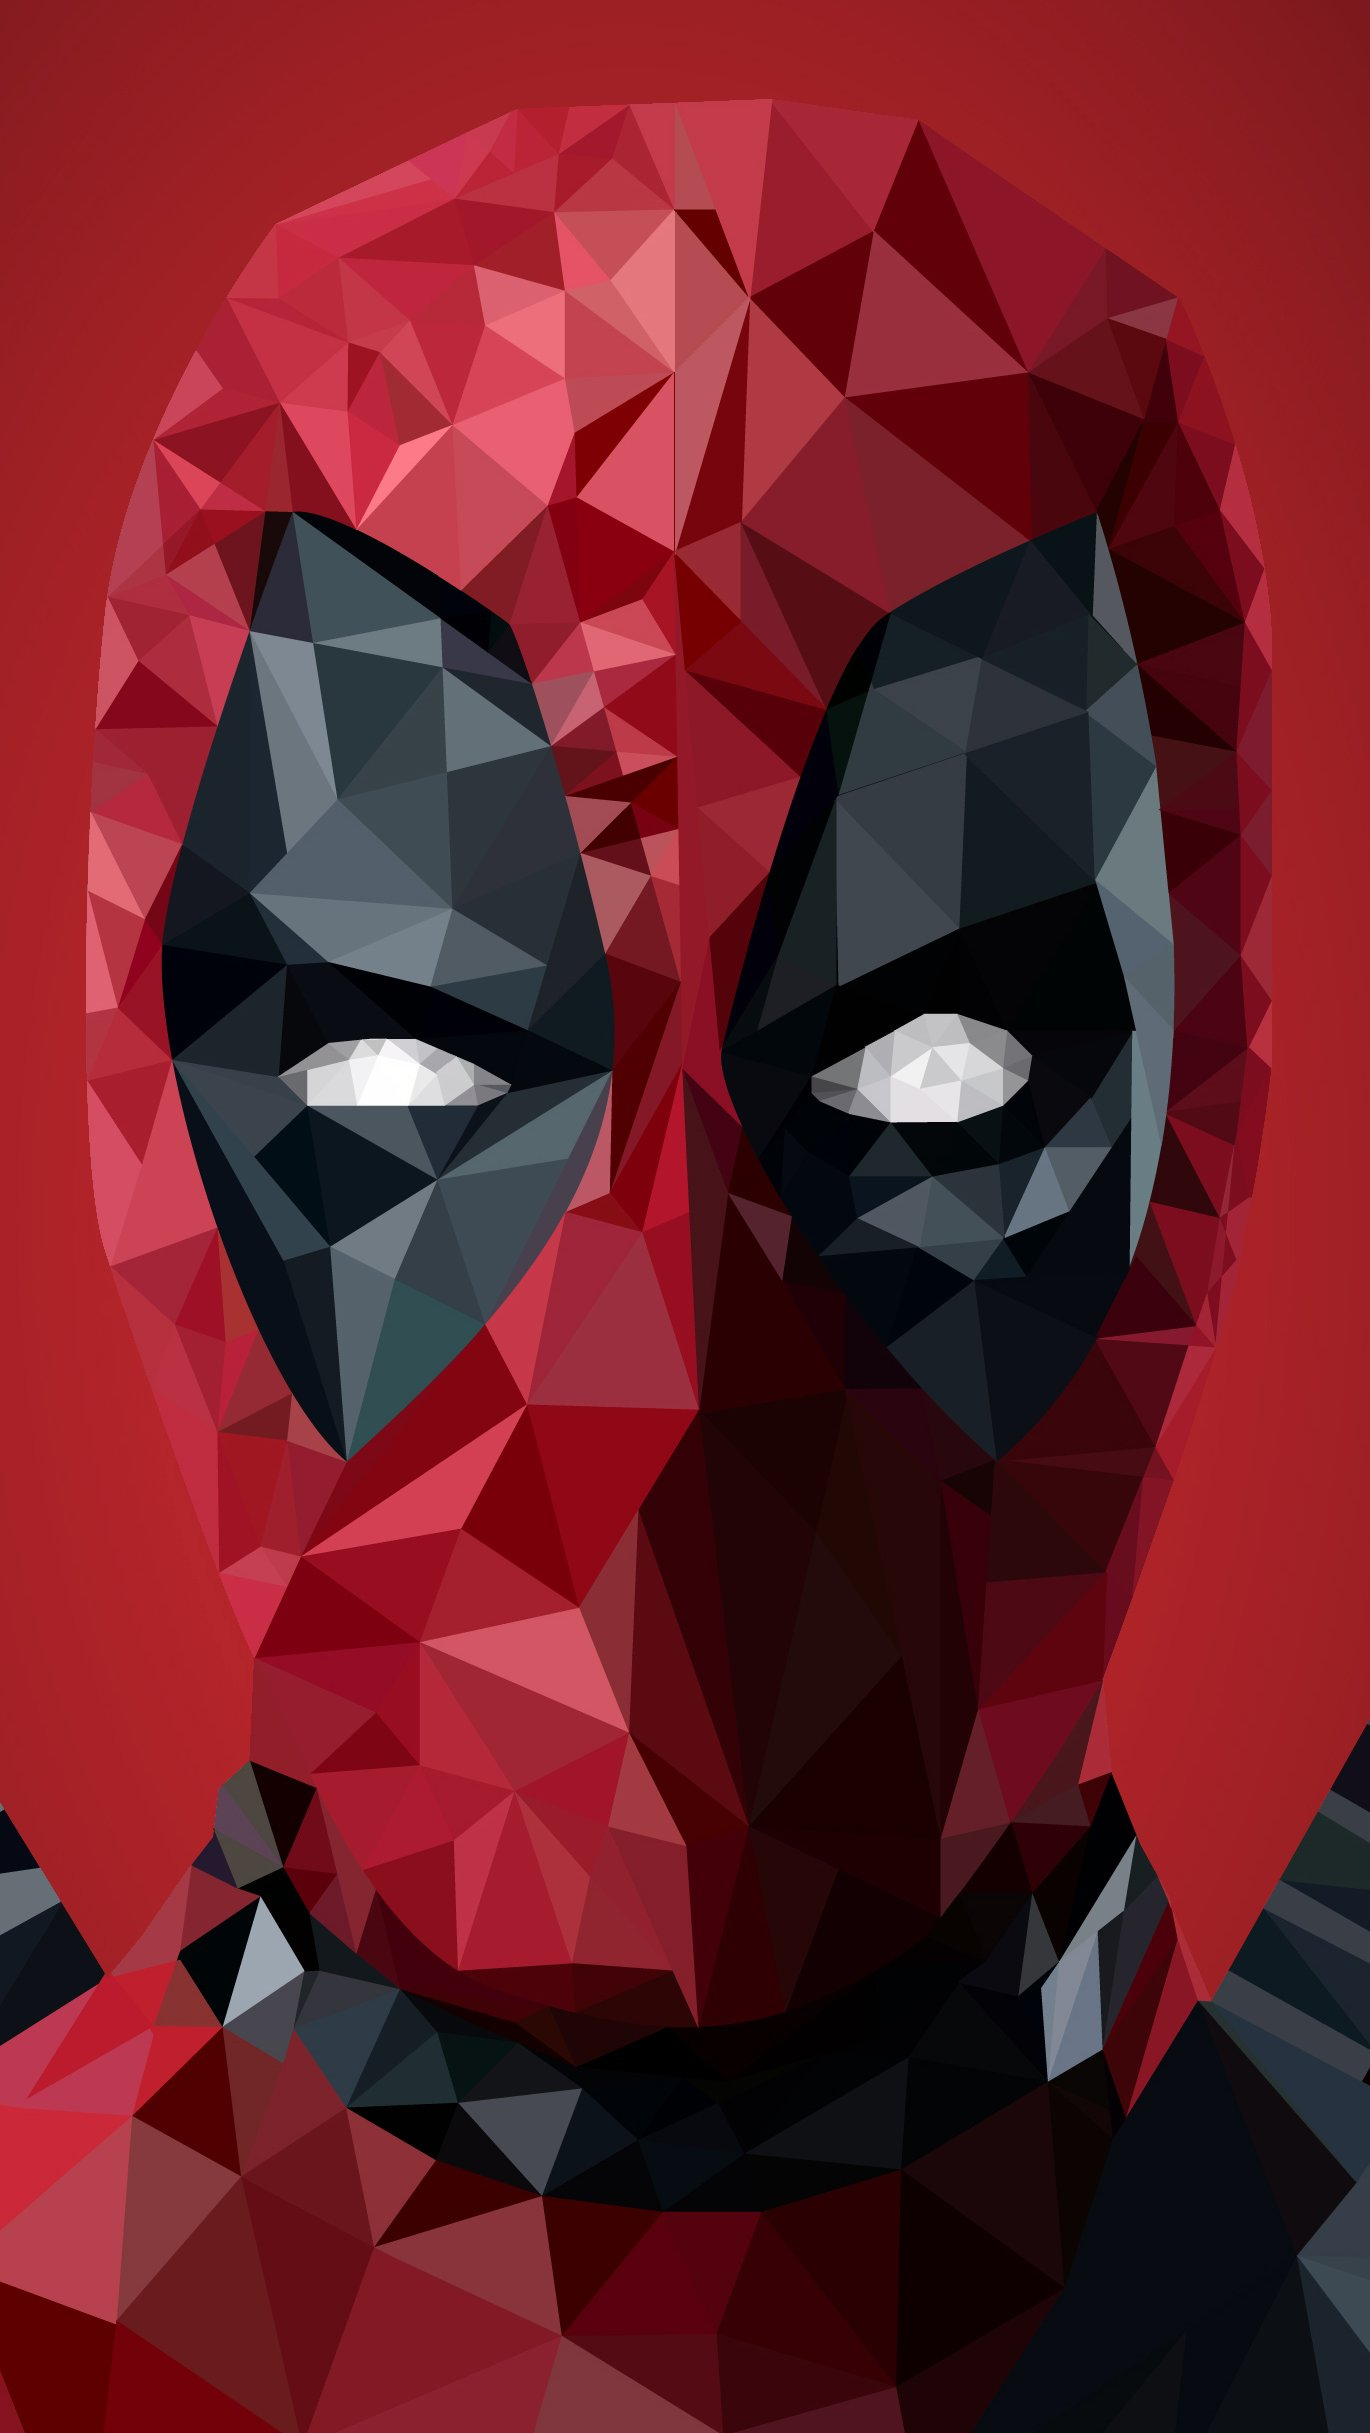 Wallpaper Deadpool Low Poly Art Vertical